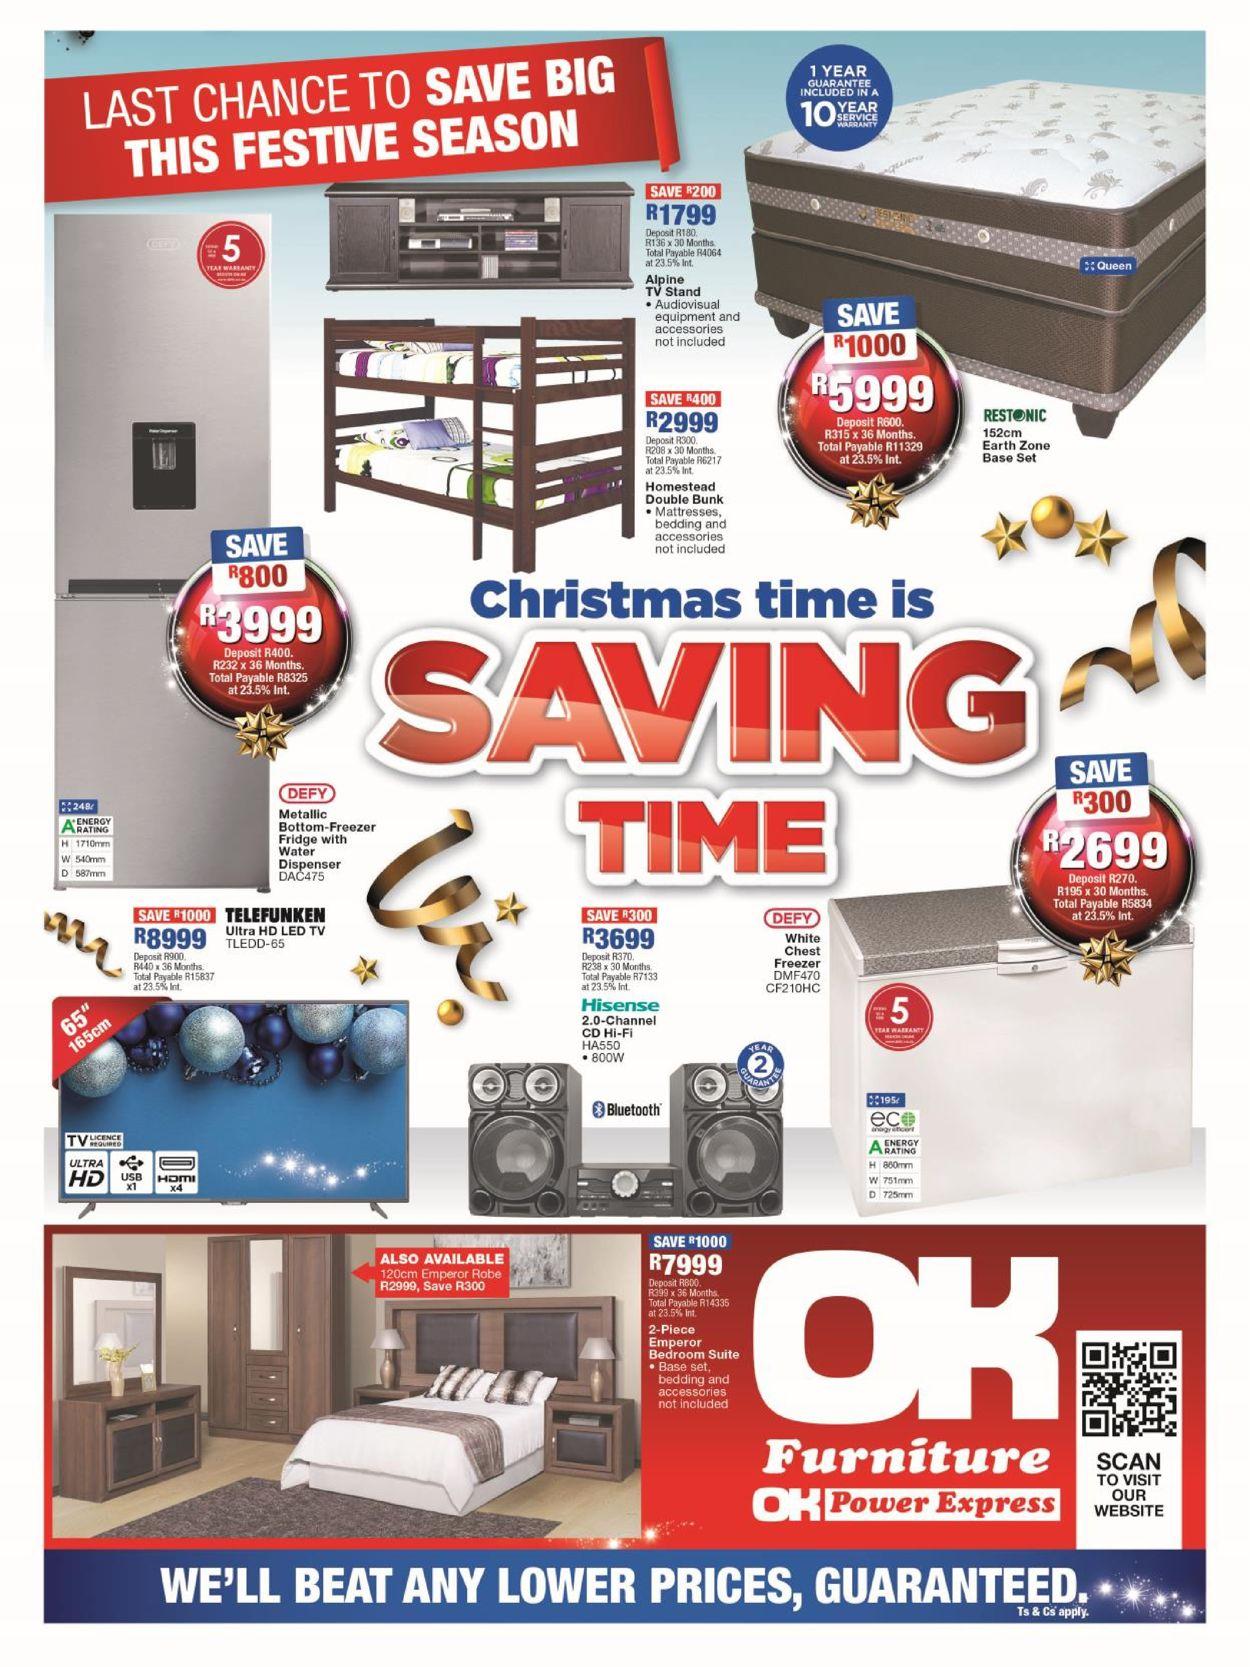 OK Furniture Christmas Catalogue 2019 Catalogue - 2019/12/10-2019/12/22